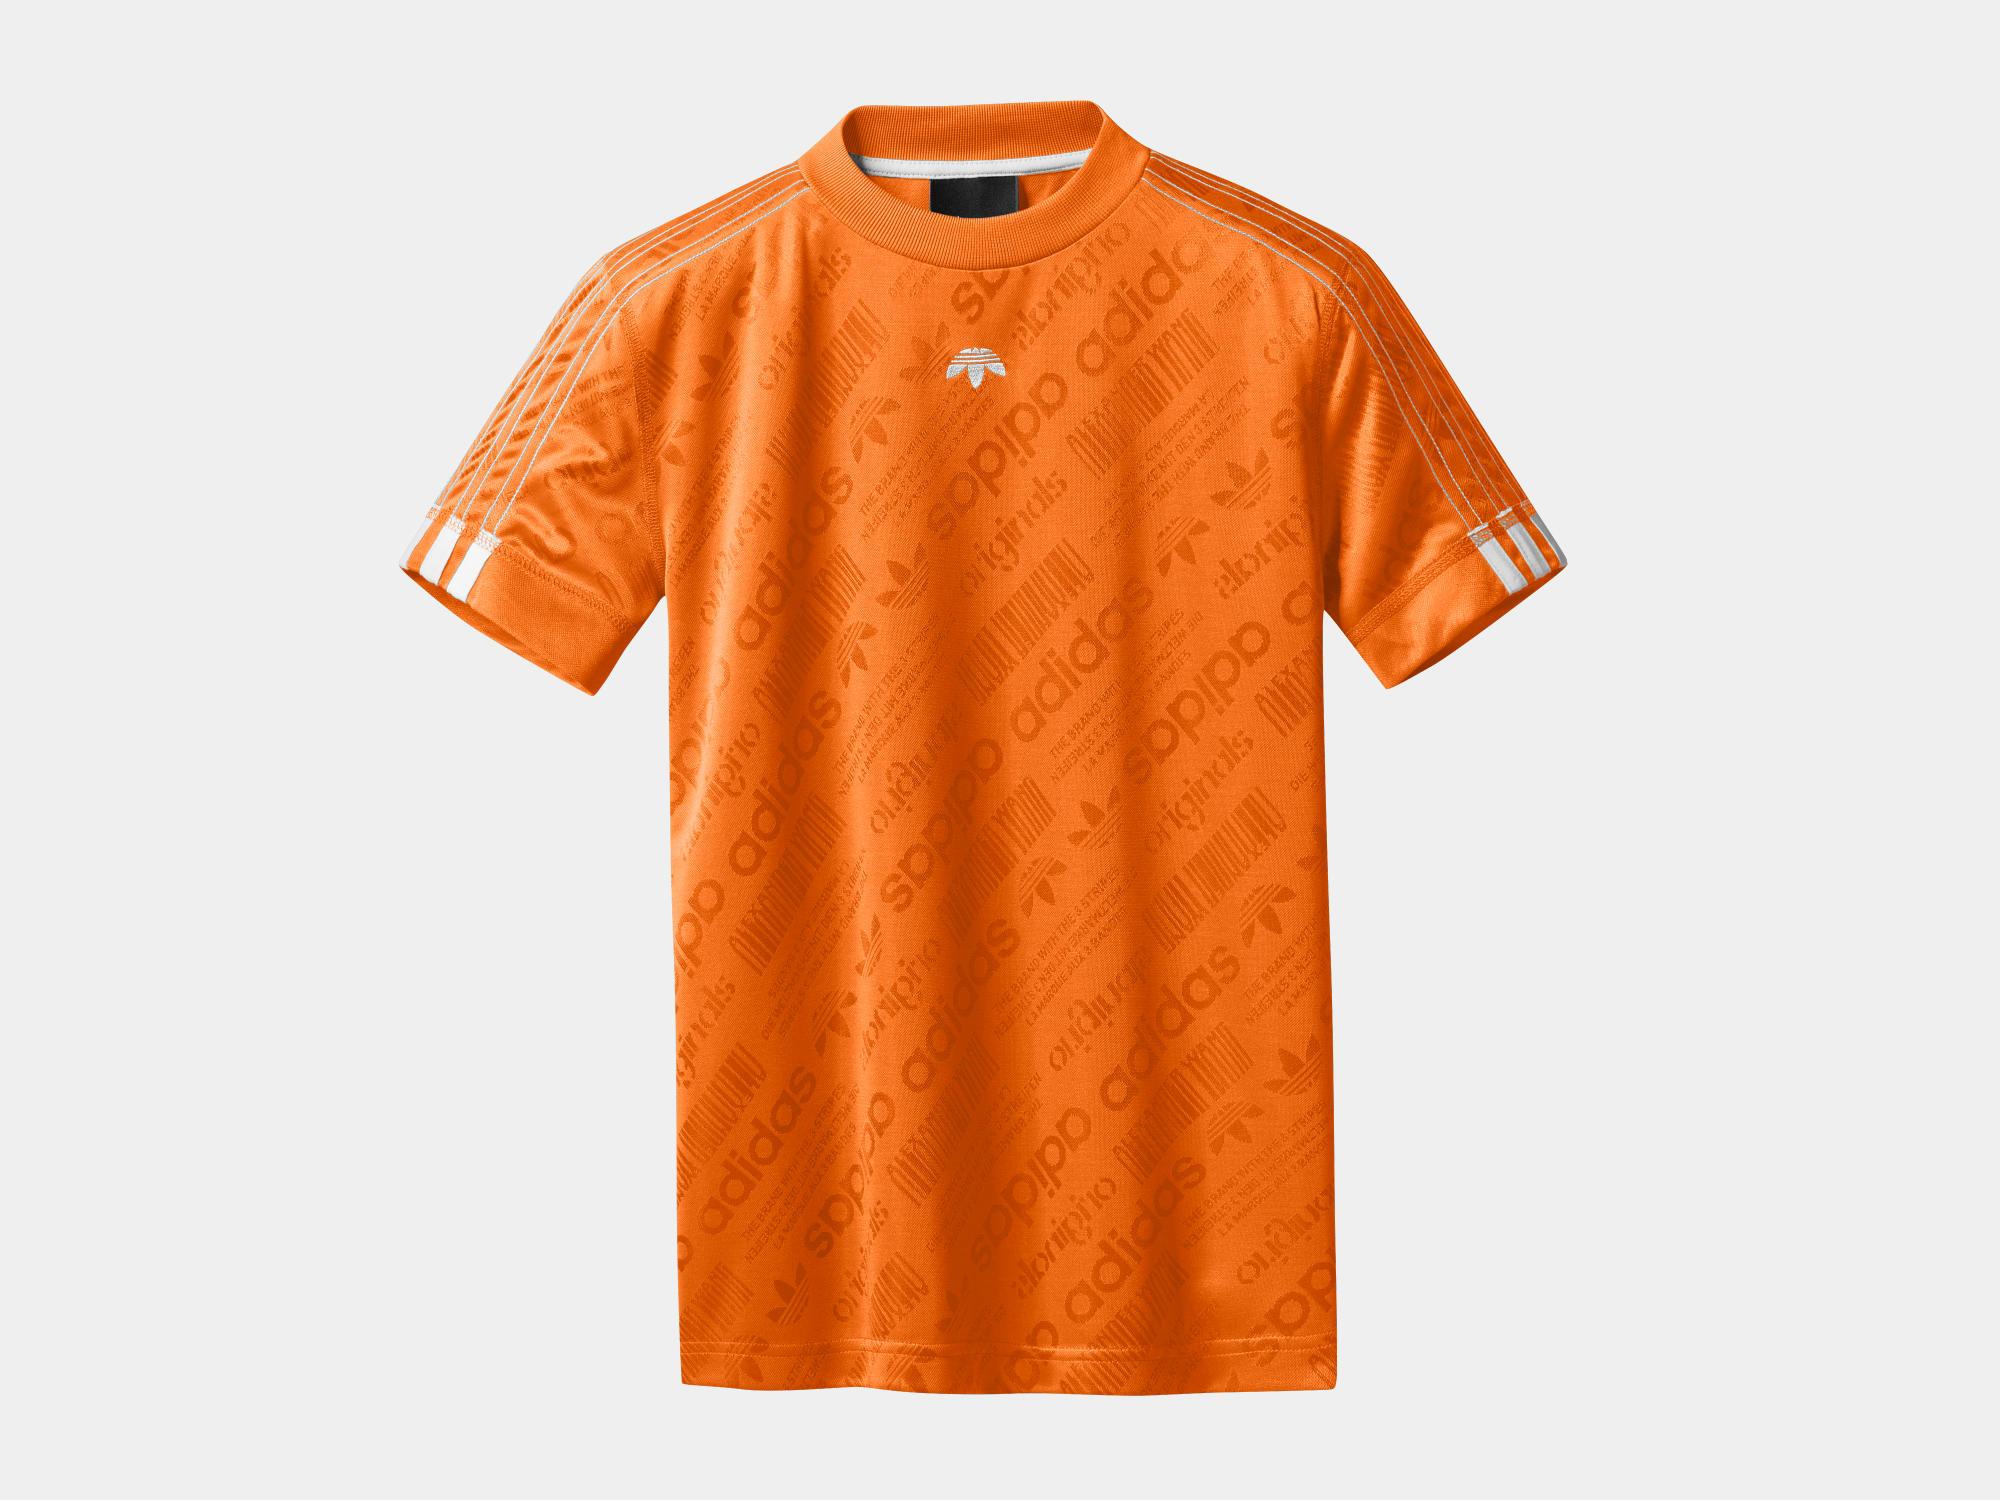 af0392db New Alexander Wang x Adidas Originals Collab: See Every Piece ...